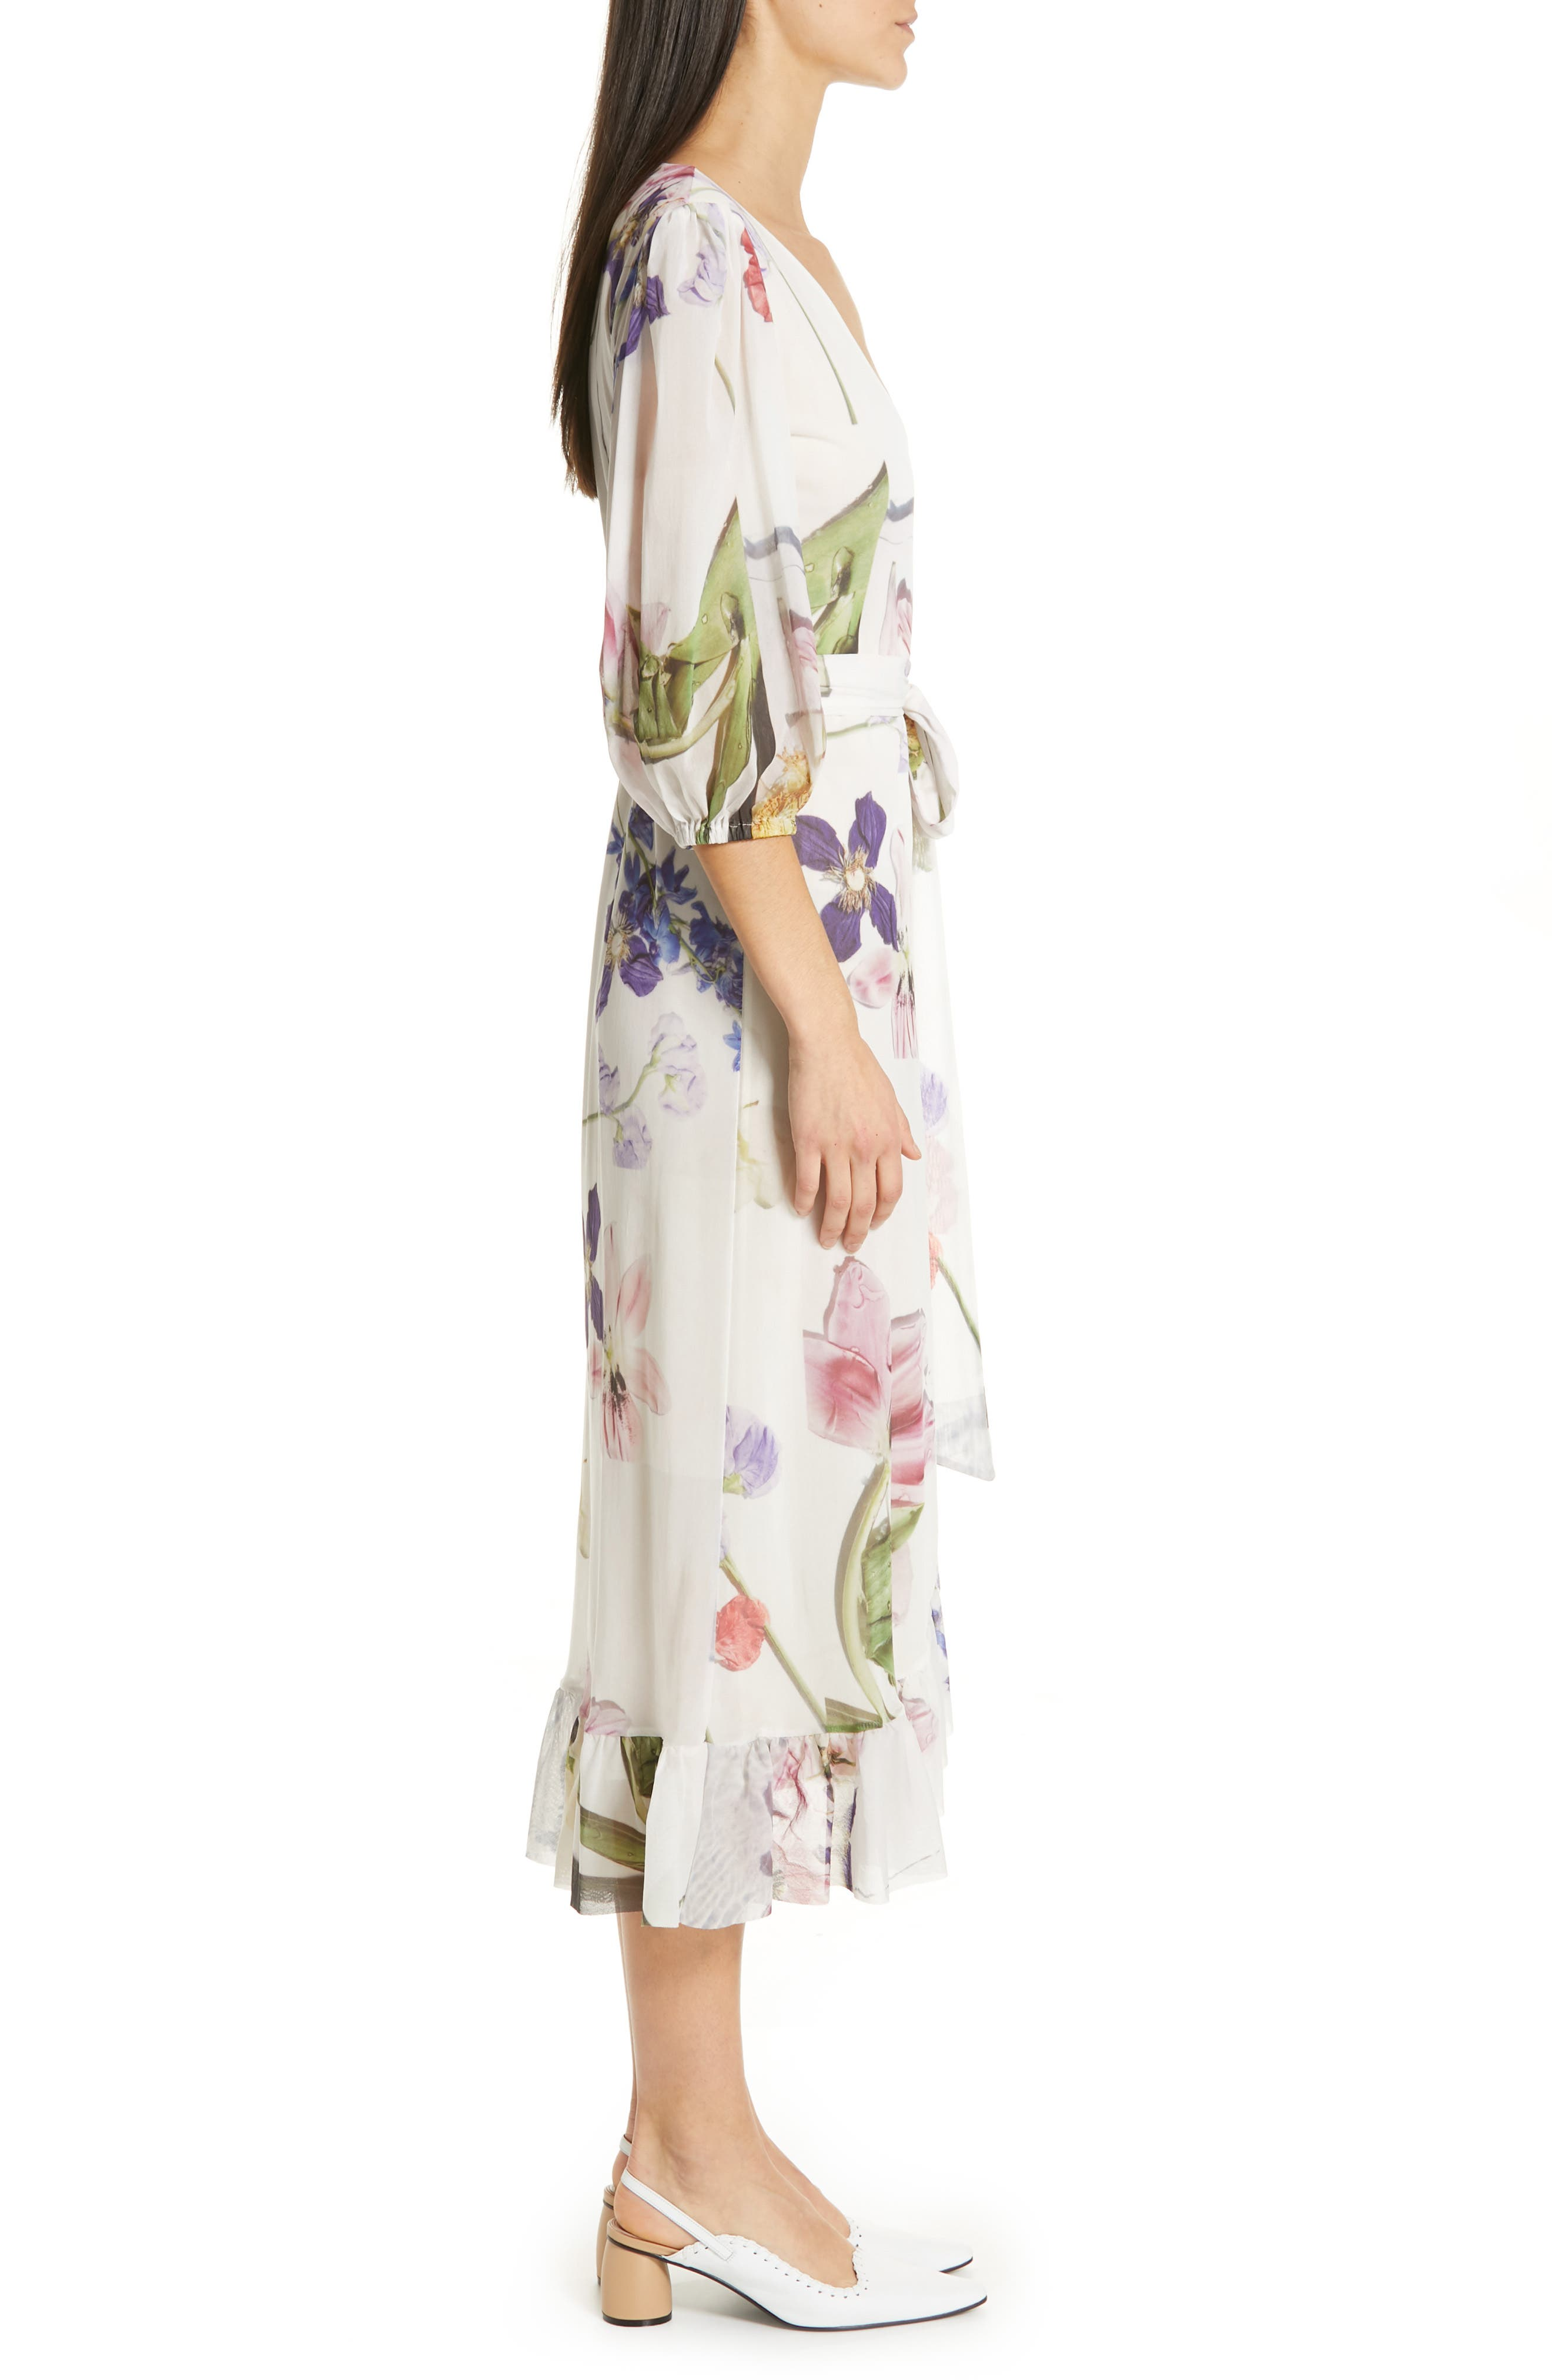 GANNI, Floral Print Mesh Dress, Alternate thumbnail 4, color, BRIGHT WHITE